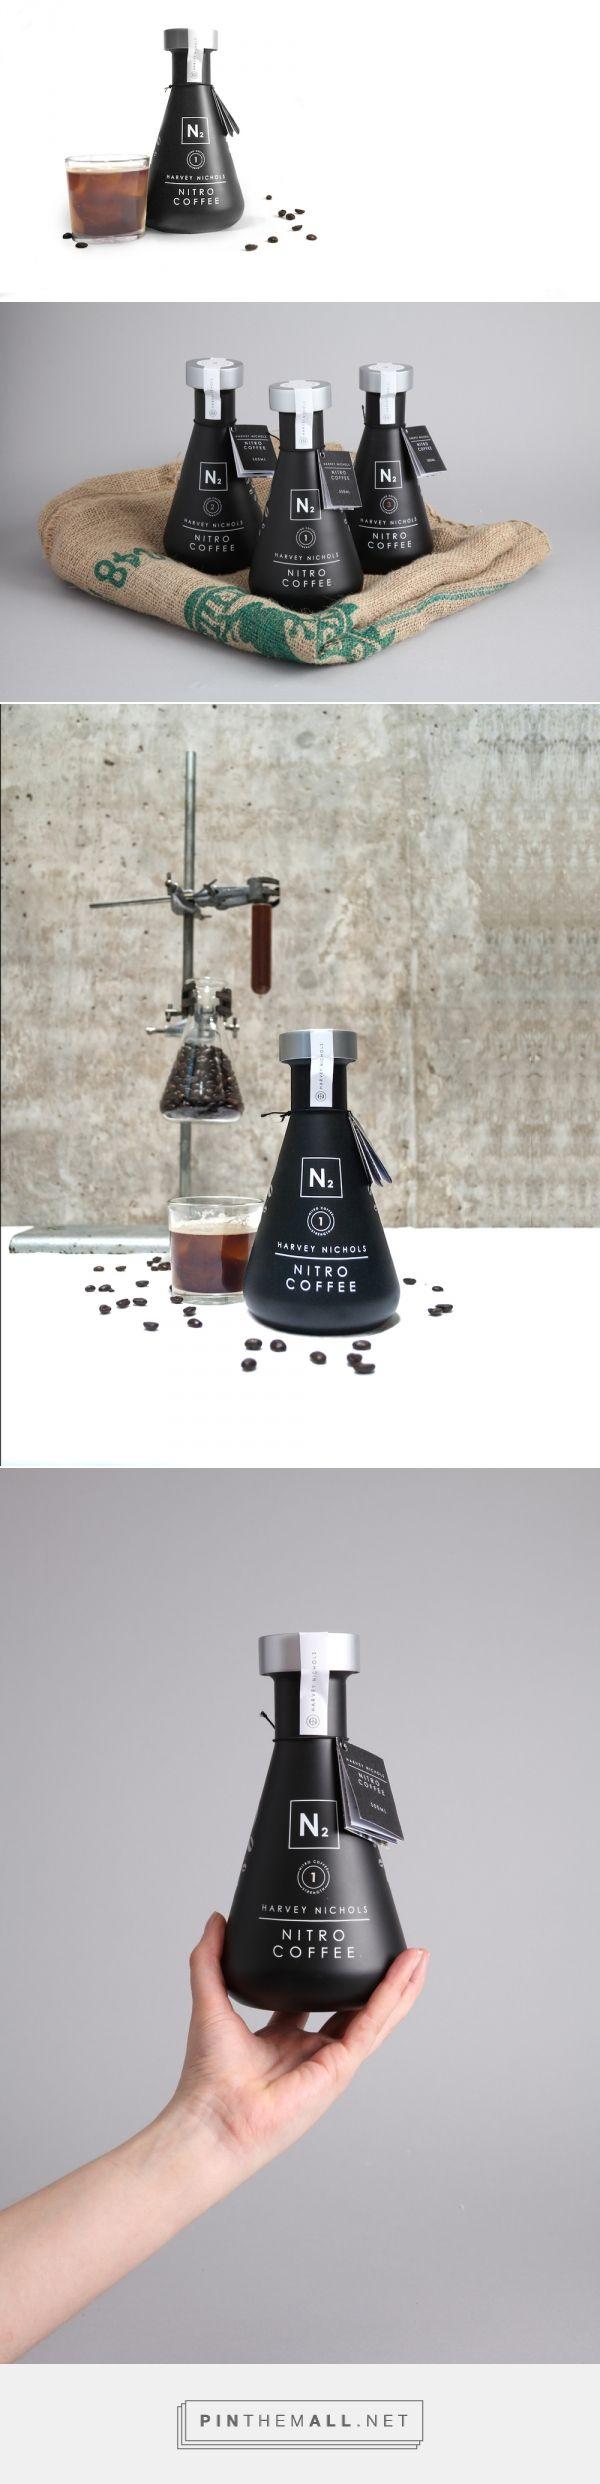 Nitro Coffee Packaging by Jon Cooper | Fivestar Branding – Design and Branding Agency & Inspiration Gallery